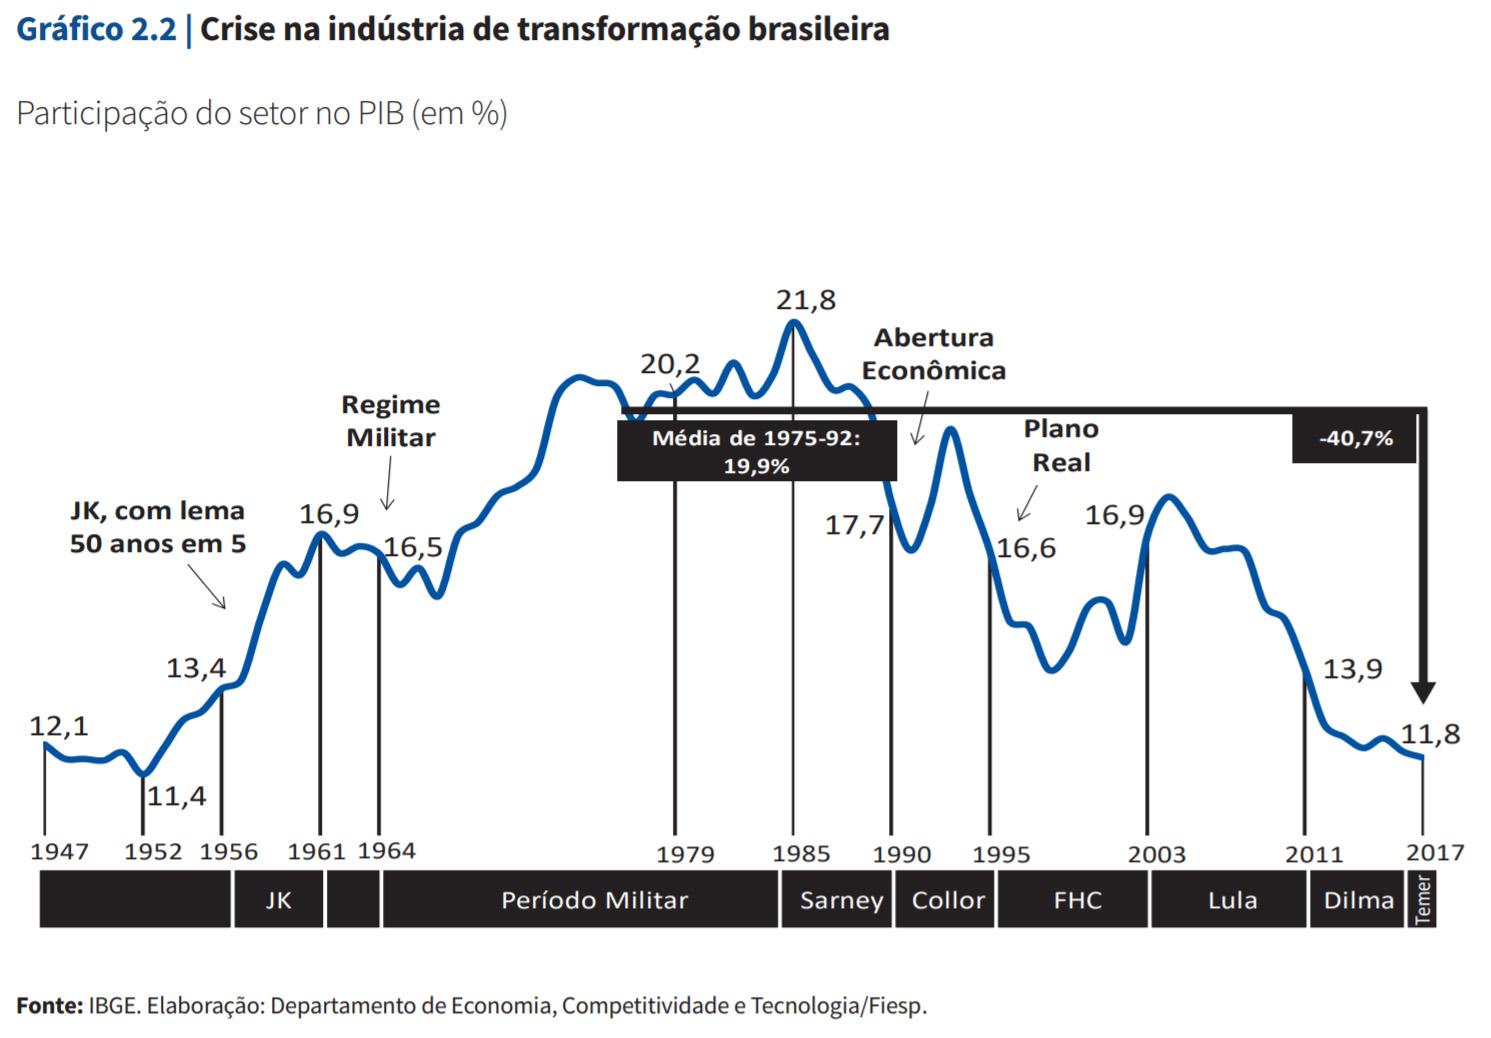 Crise na indústria brasileira